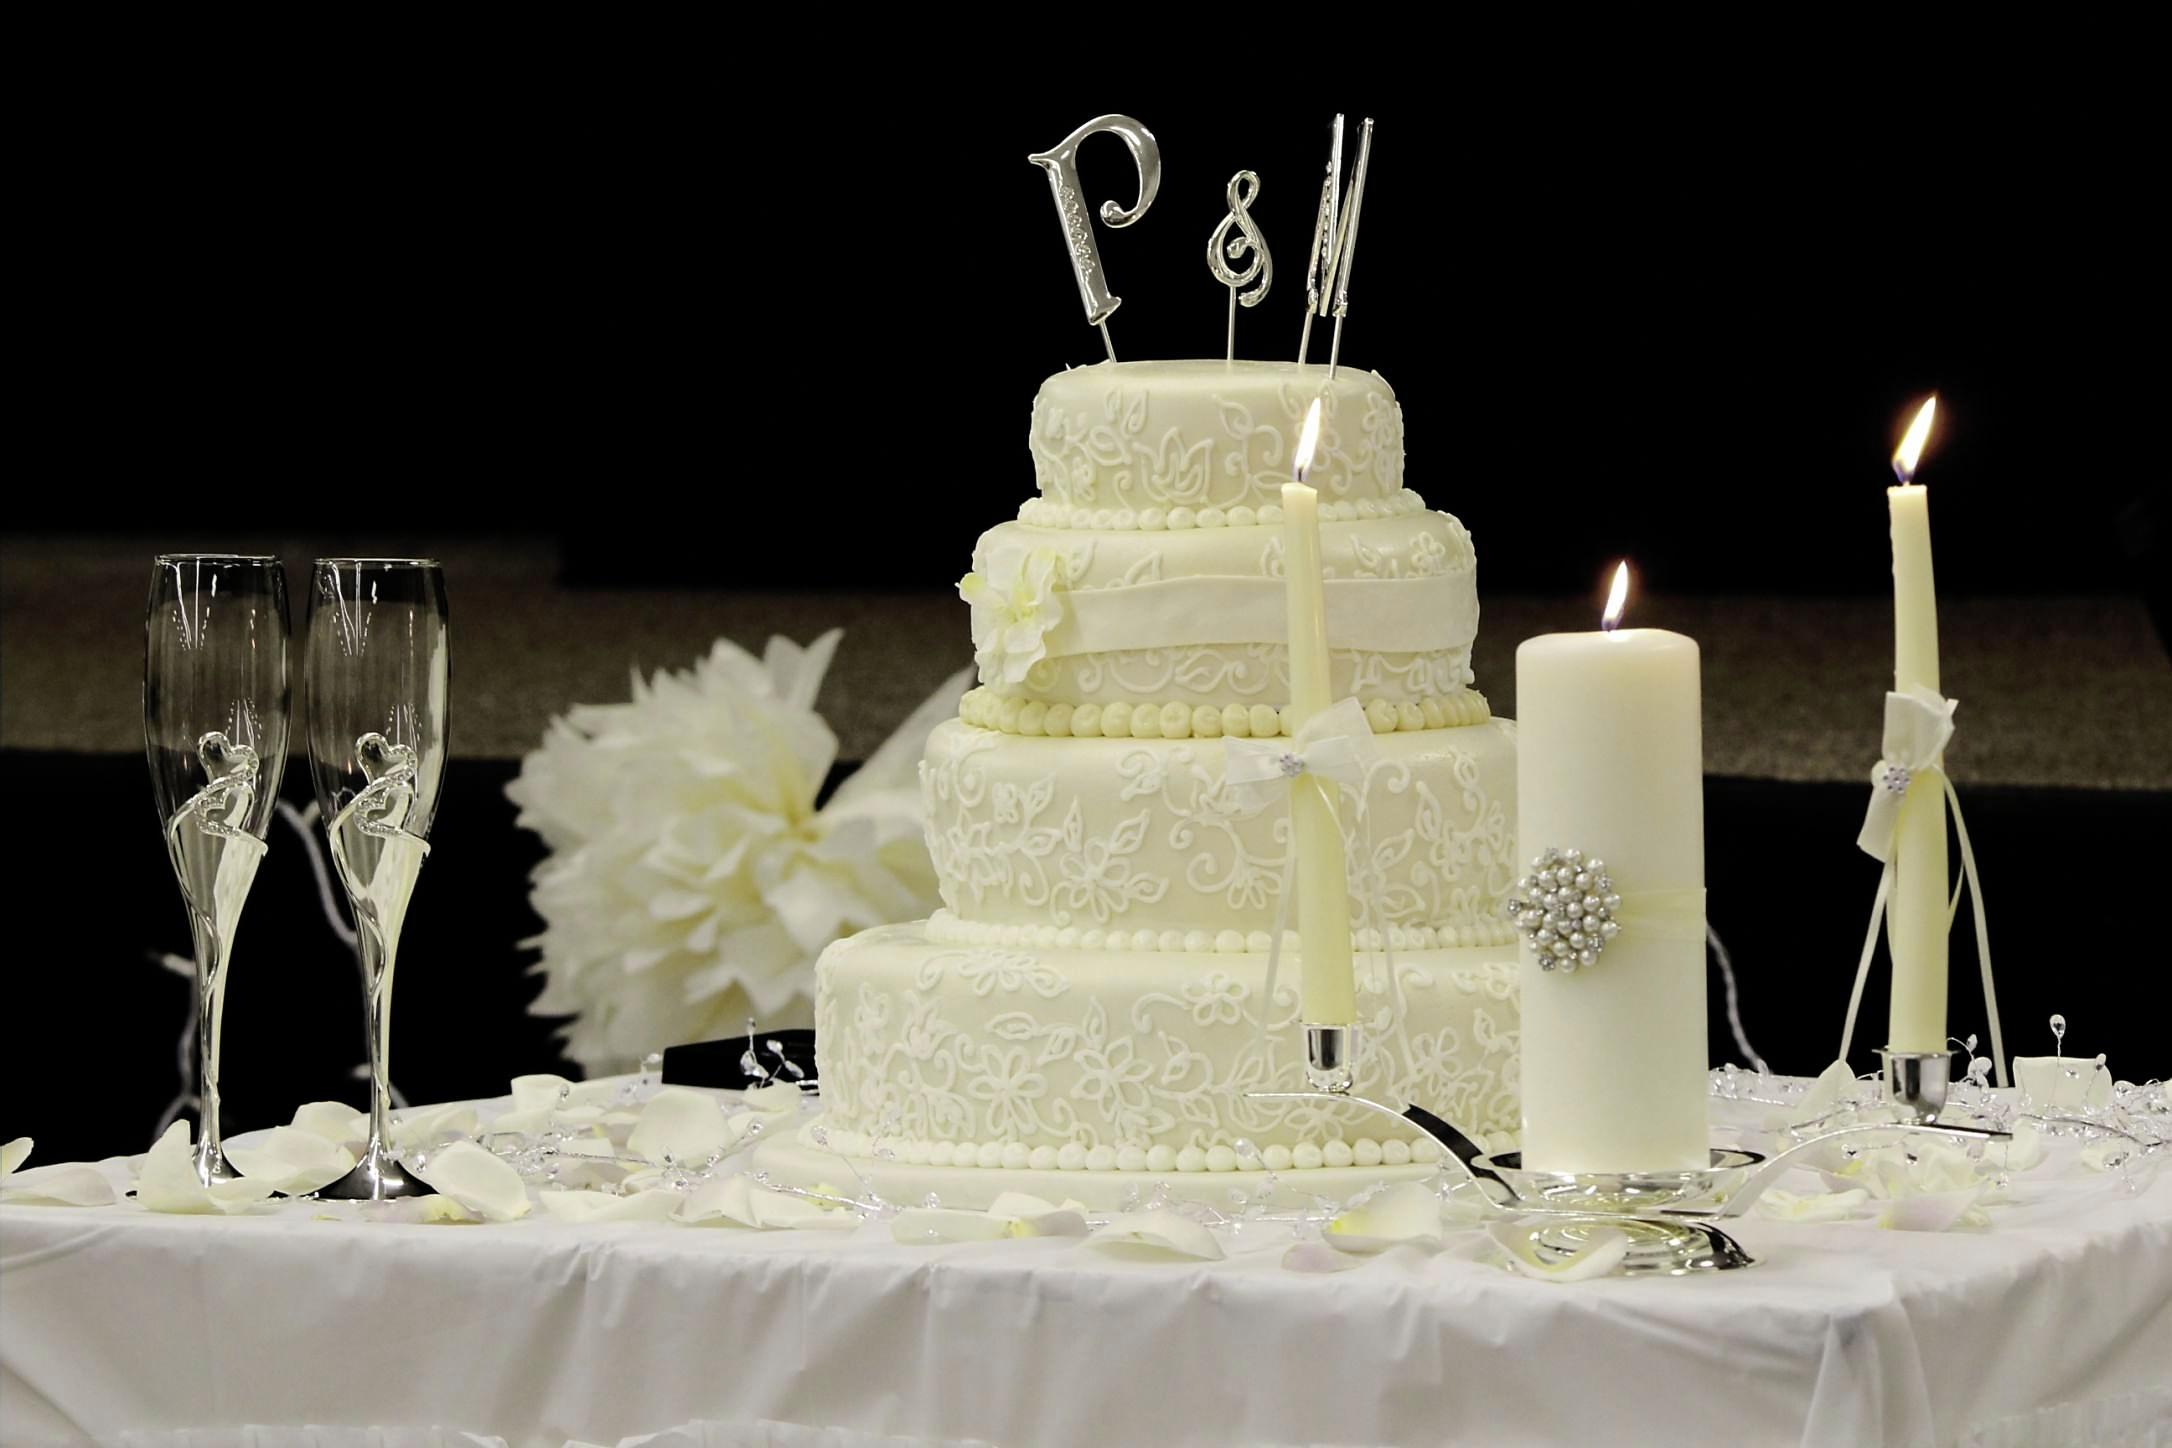 Astounding 11 Sams Club Music Cakes Photo Sams Club Wedding Cake Sams Funny Birthday Cards Online Aboleapandamsfinfo